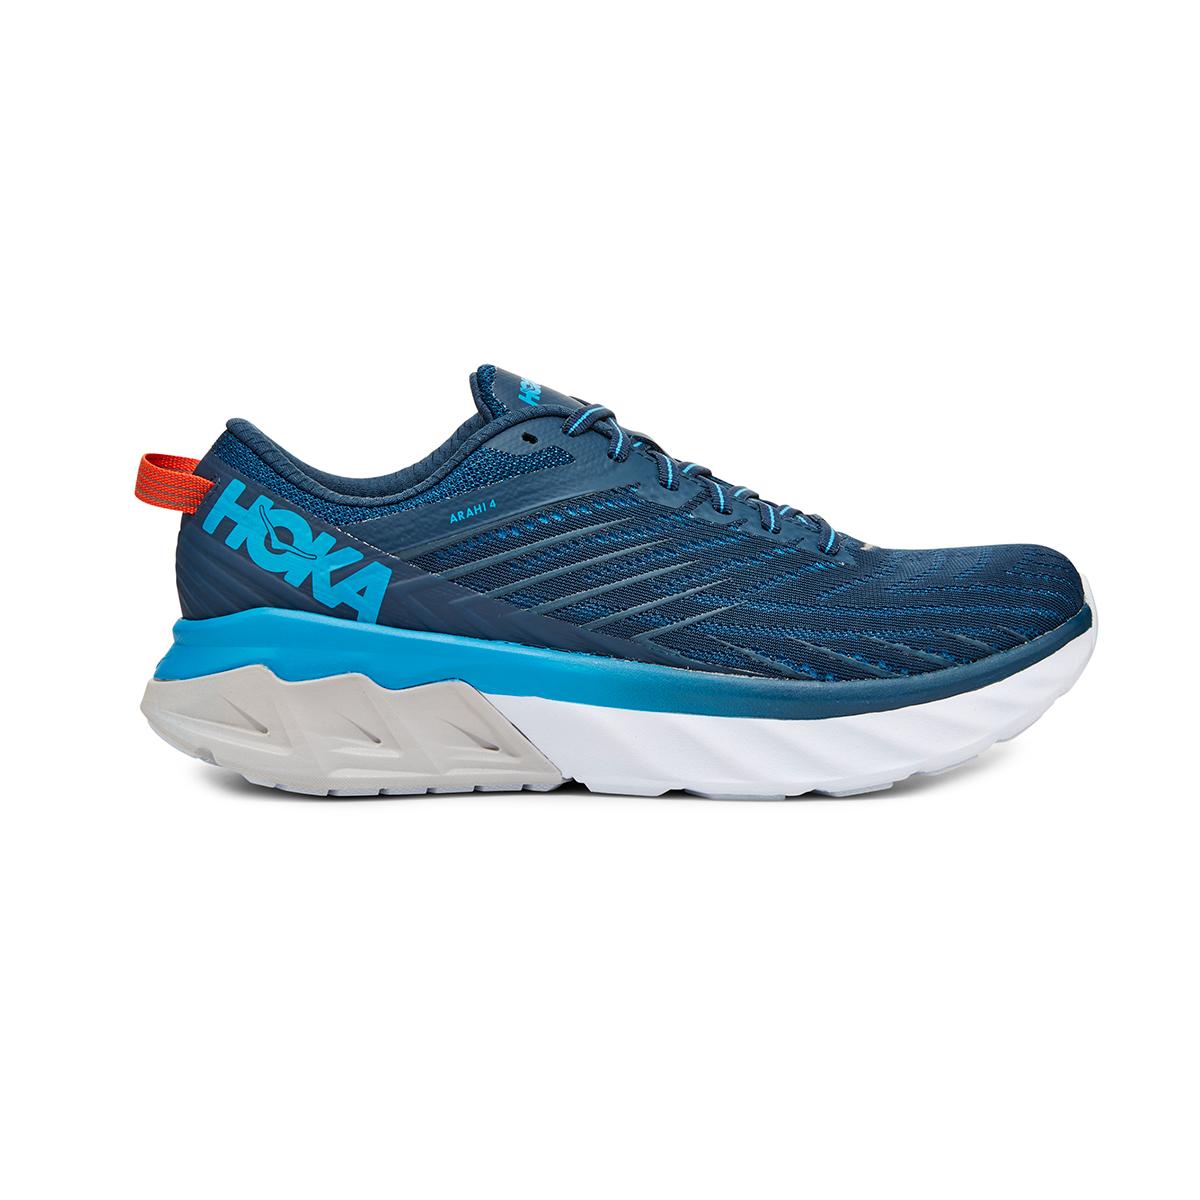 Men's Hoka One One Arahi 4 Running Shoe - Color: Majolica Blue/Dresden Blue (Regular Width) - Size: 7, Majolica Blue/Dresden Blue, large, image 1